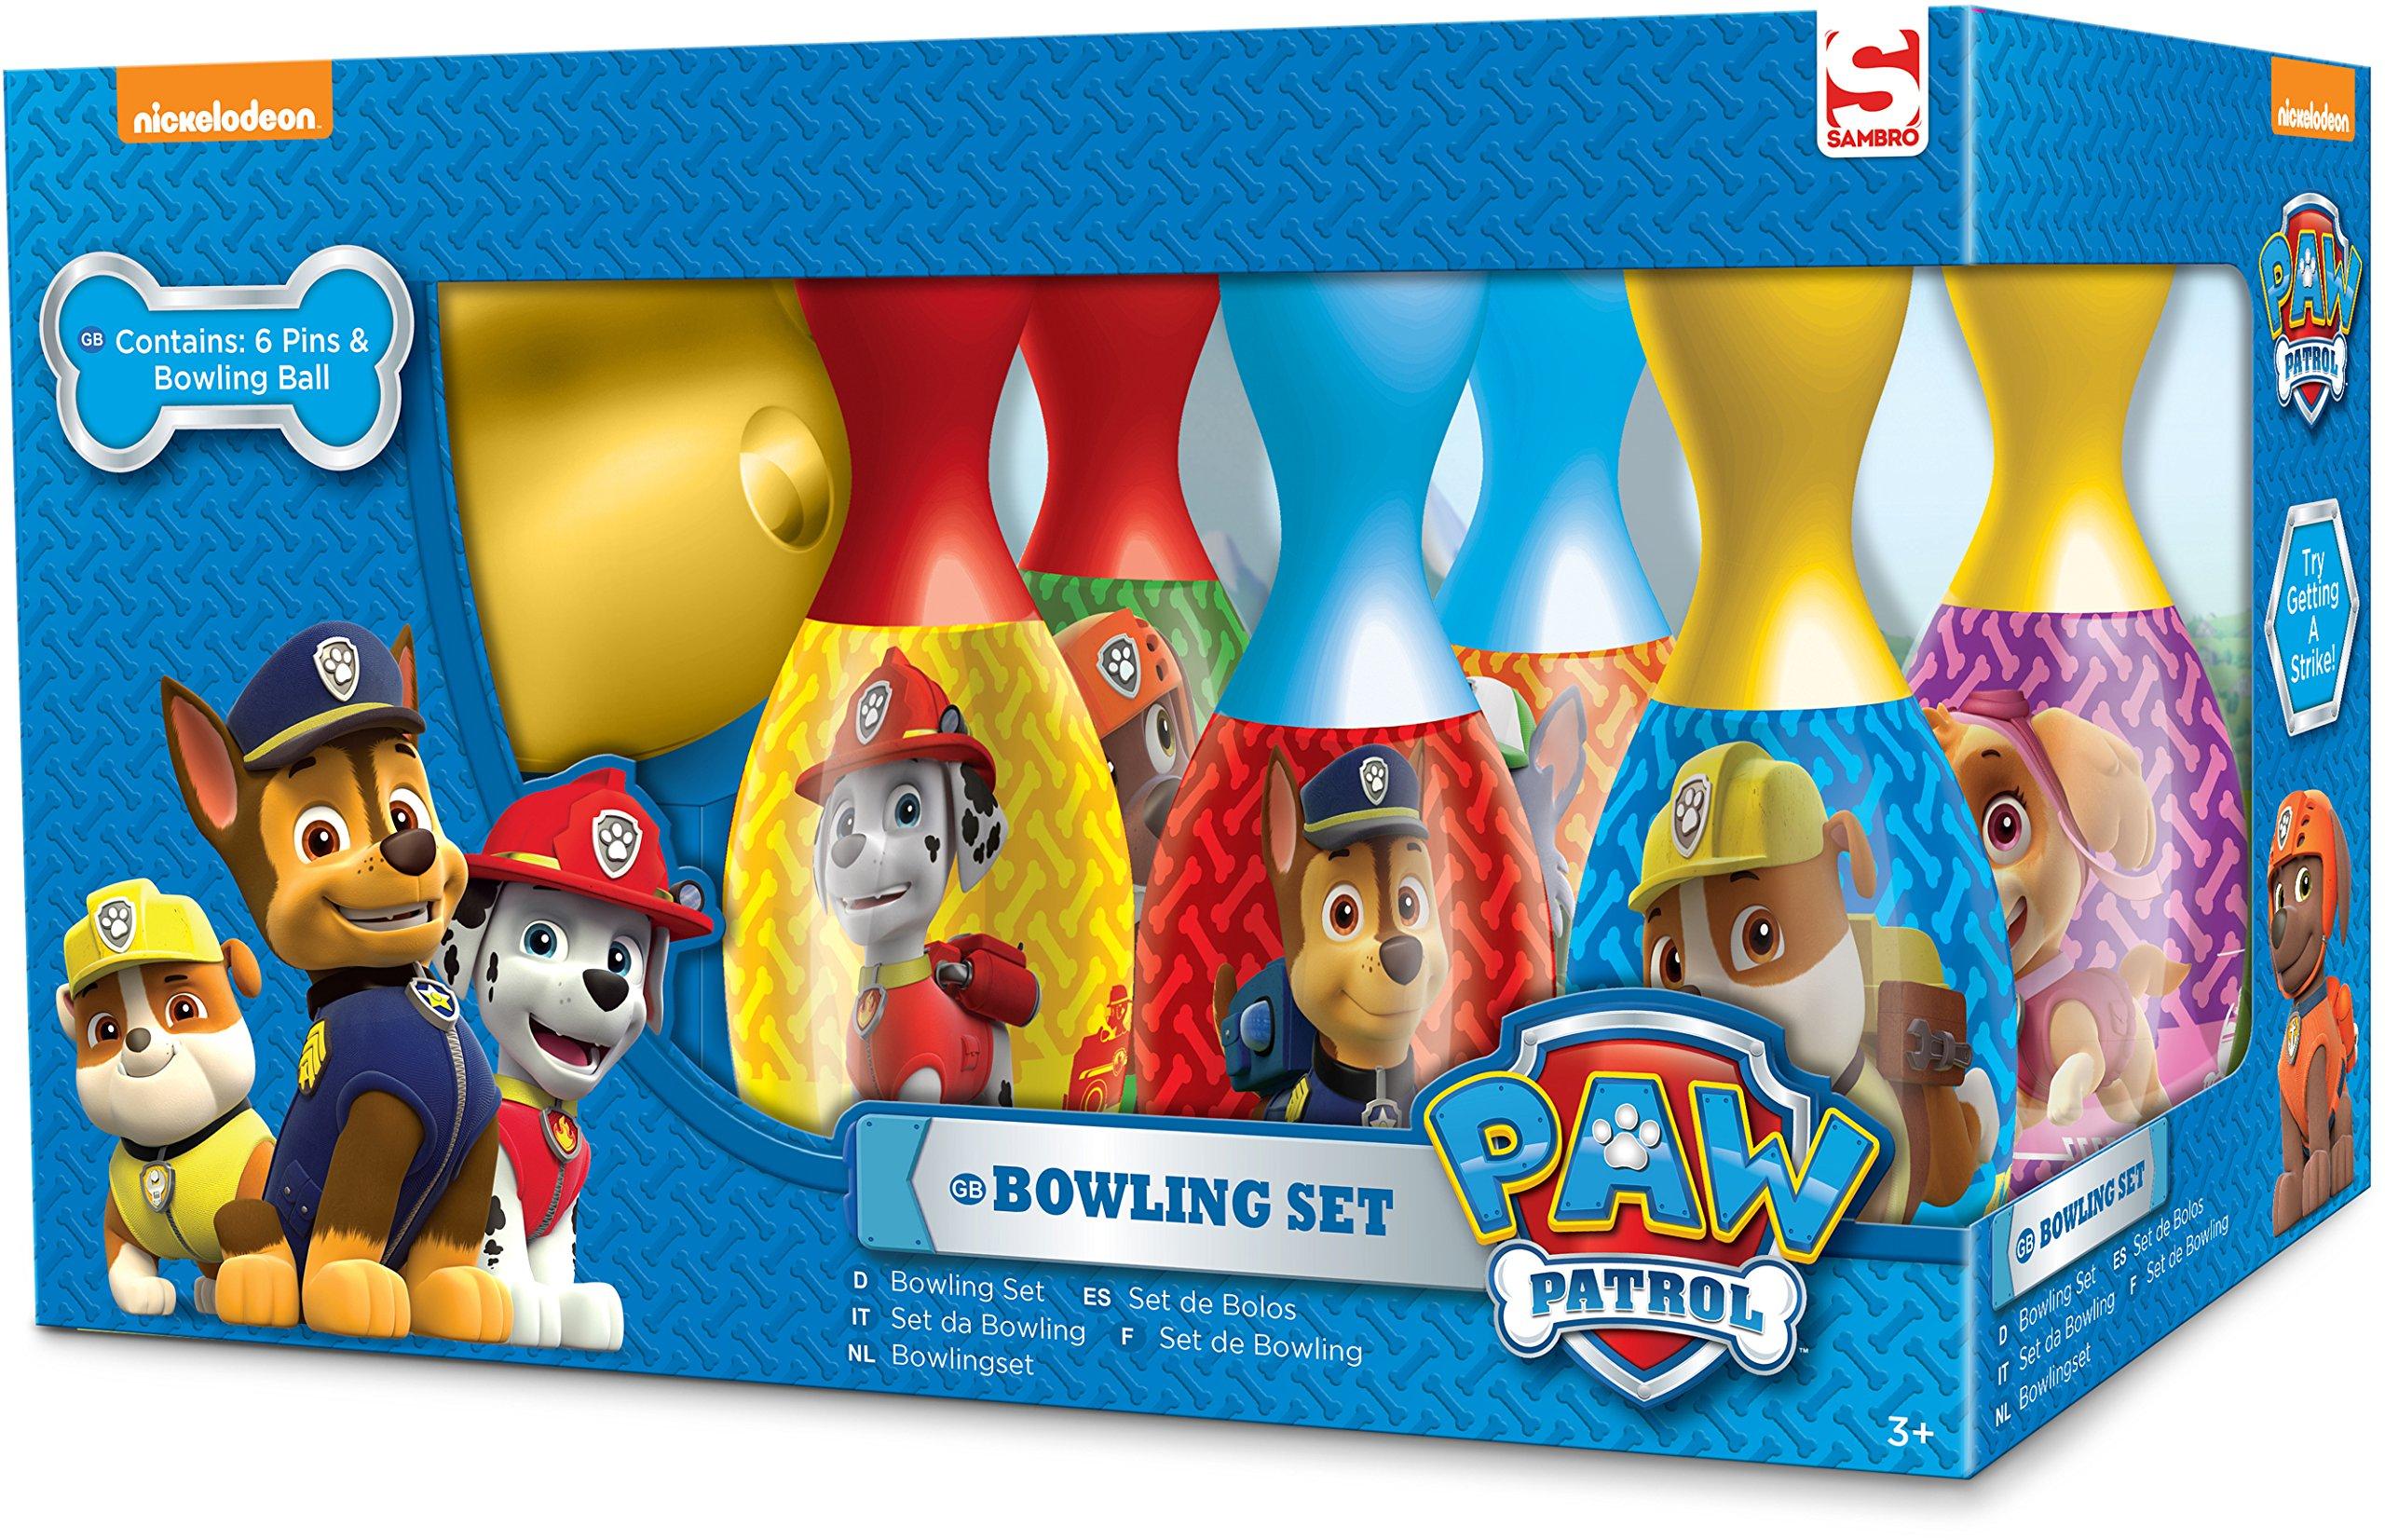 Paw Patrol 6 pin Bowling set